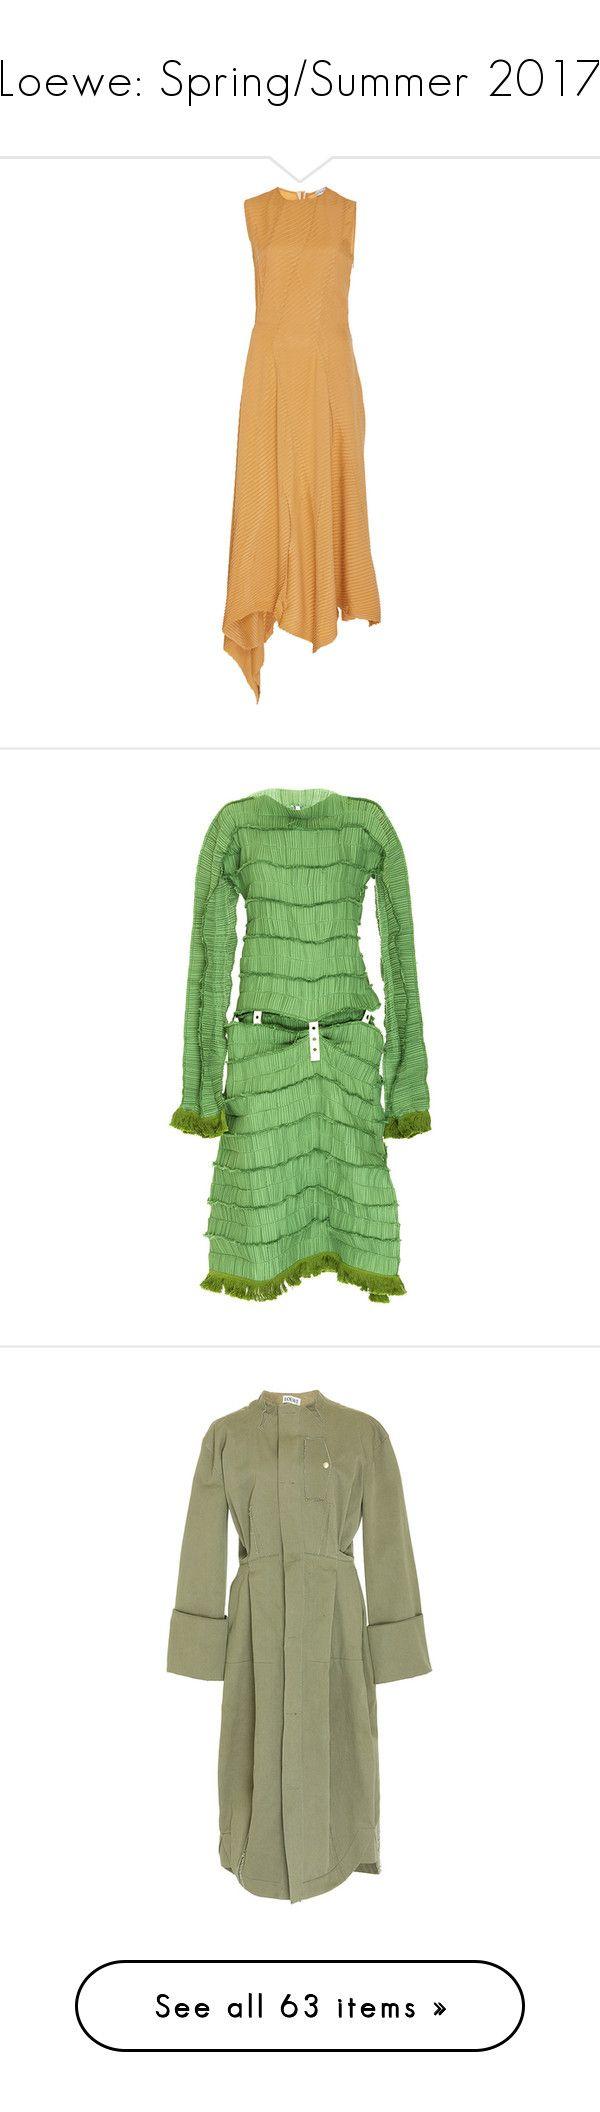 """Loewe: Spring/Summer 2017"" by livnd ❤ liked on Polyvore featuring loewe, springsummer2017, livndfashion, livndloewe, dresses, orange, beige dress, asymmetrical dresses, sleeveless asymmetrical dress and beige a line dress"